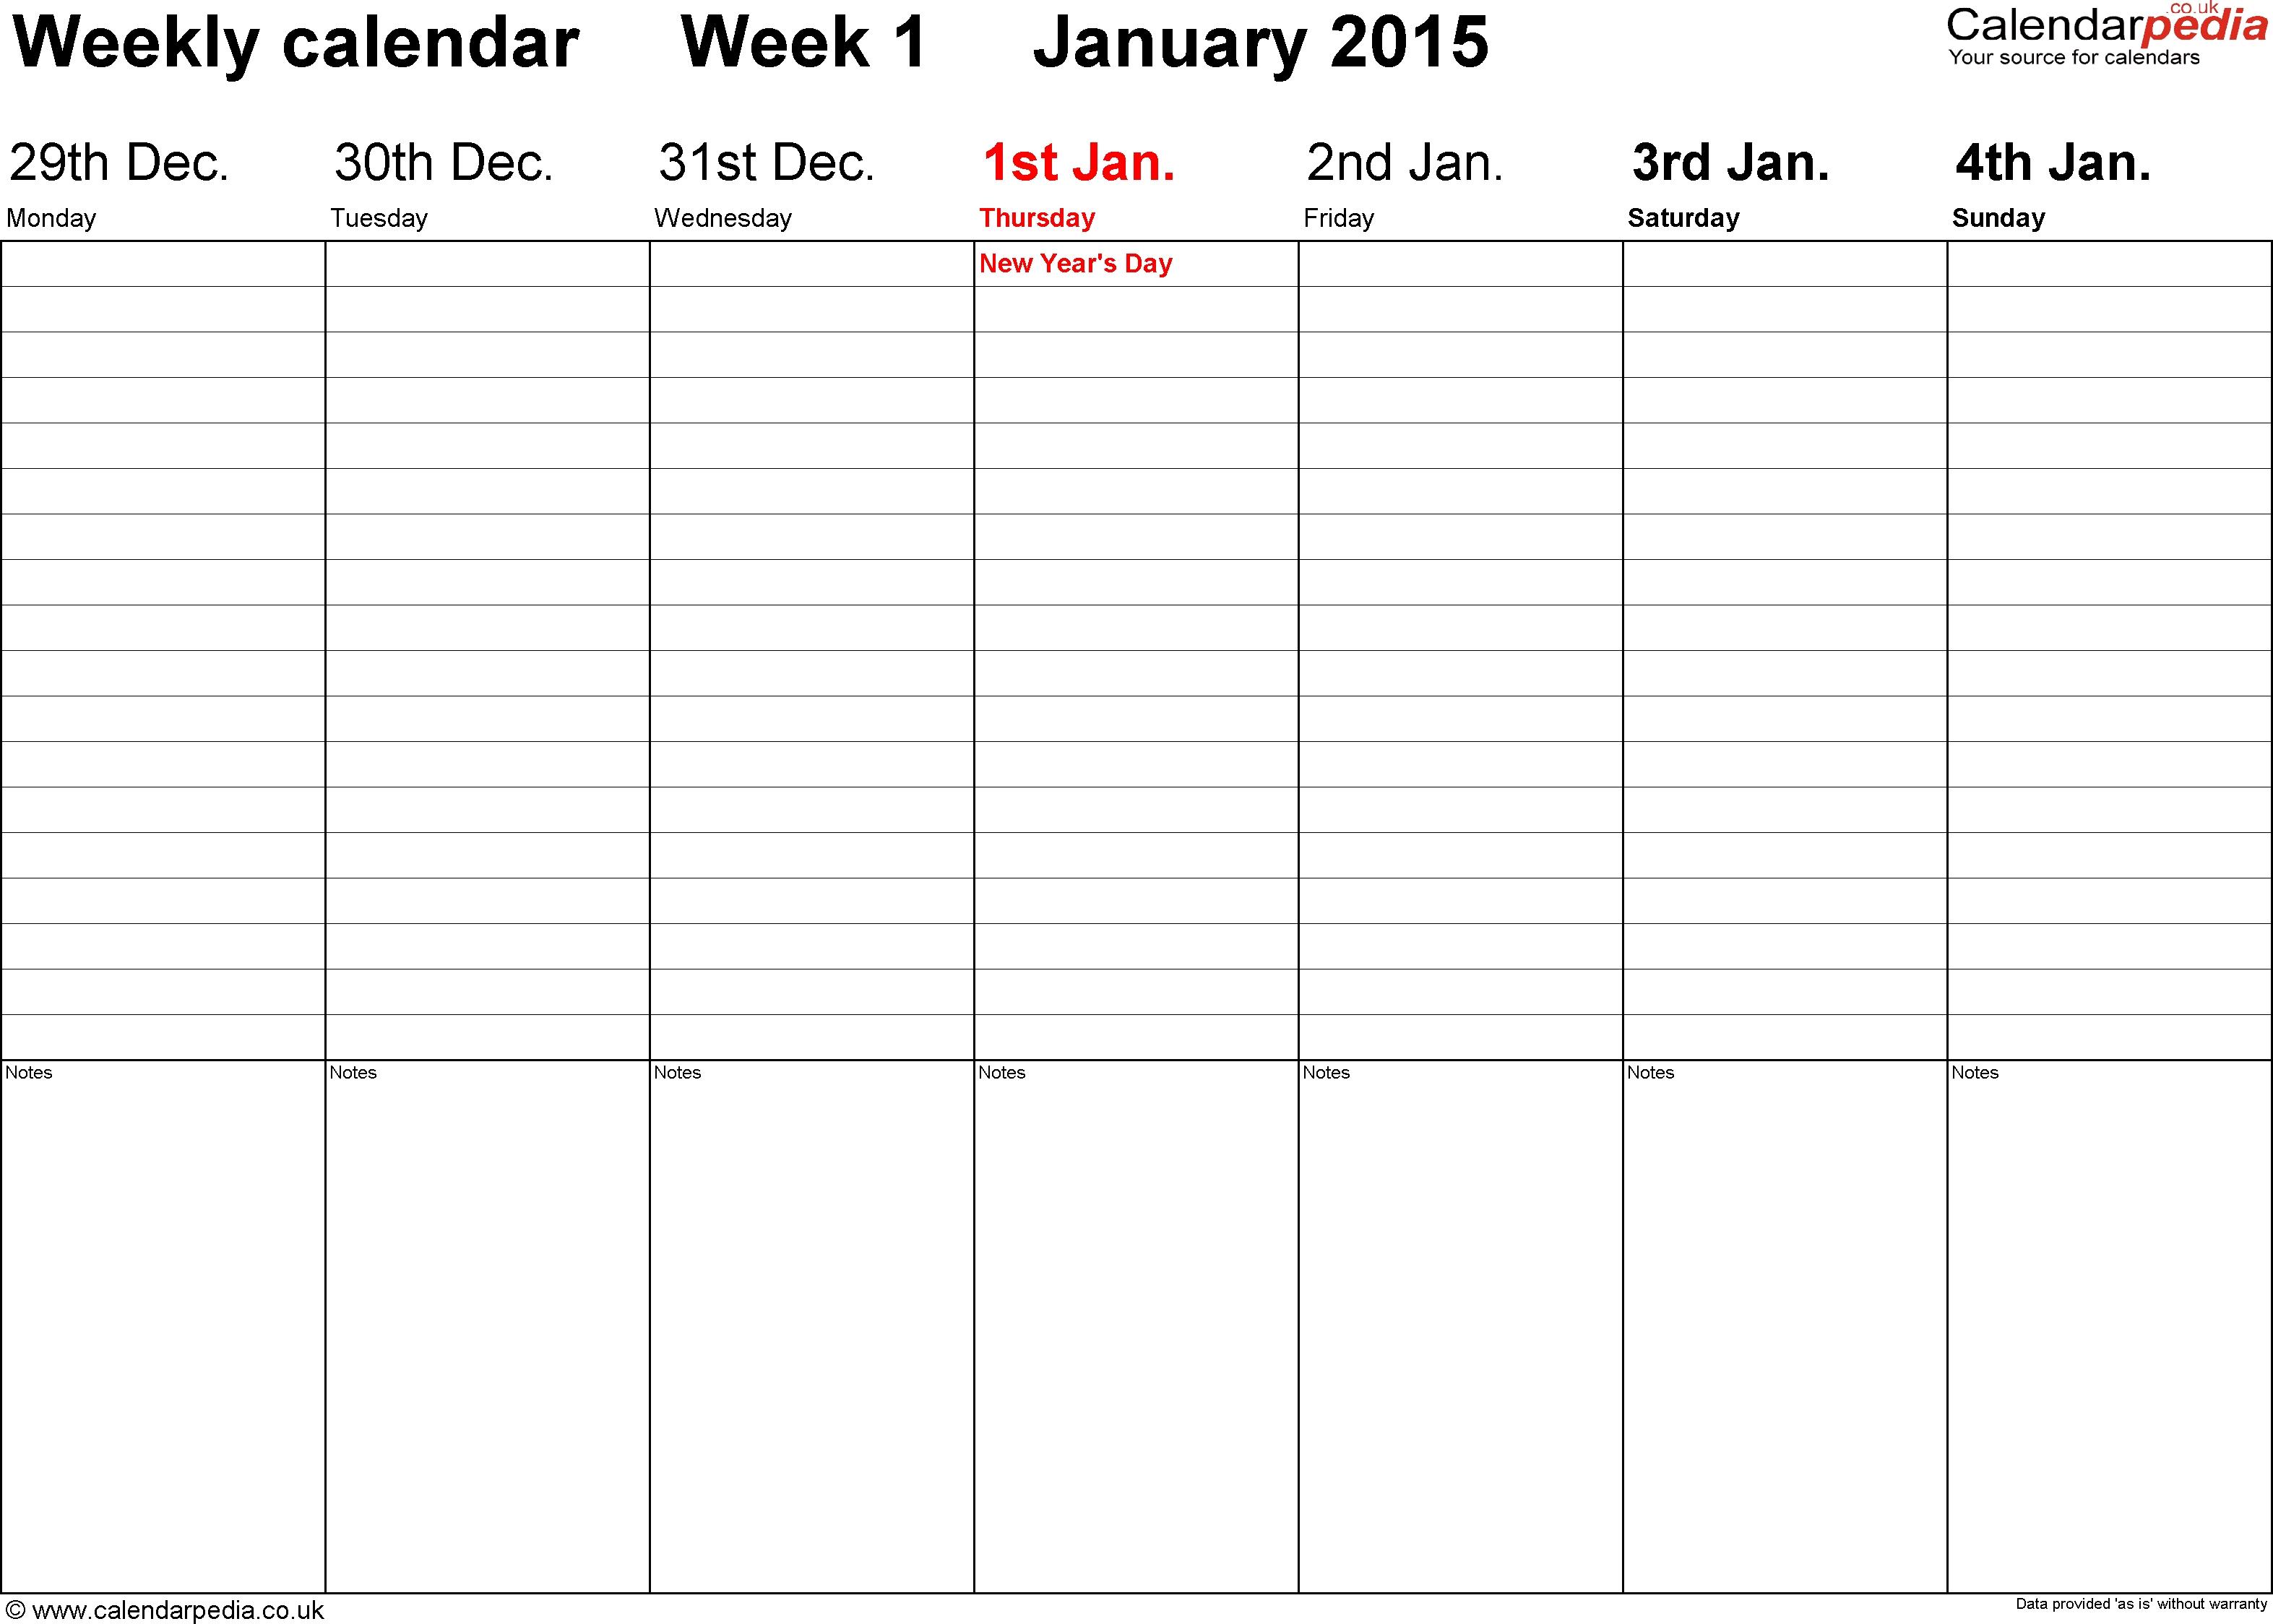 Weekly Calendar Template 2015 - Free Download-Blank Calendar Five Day